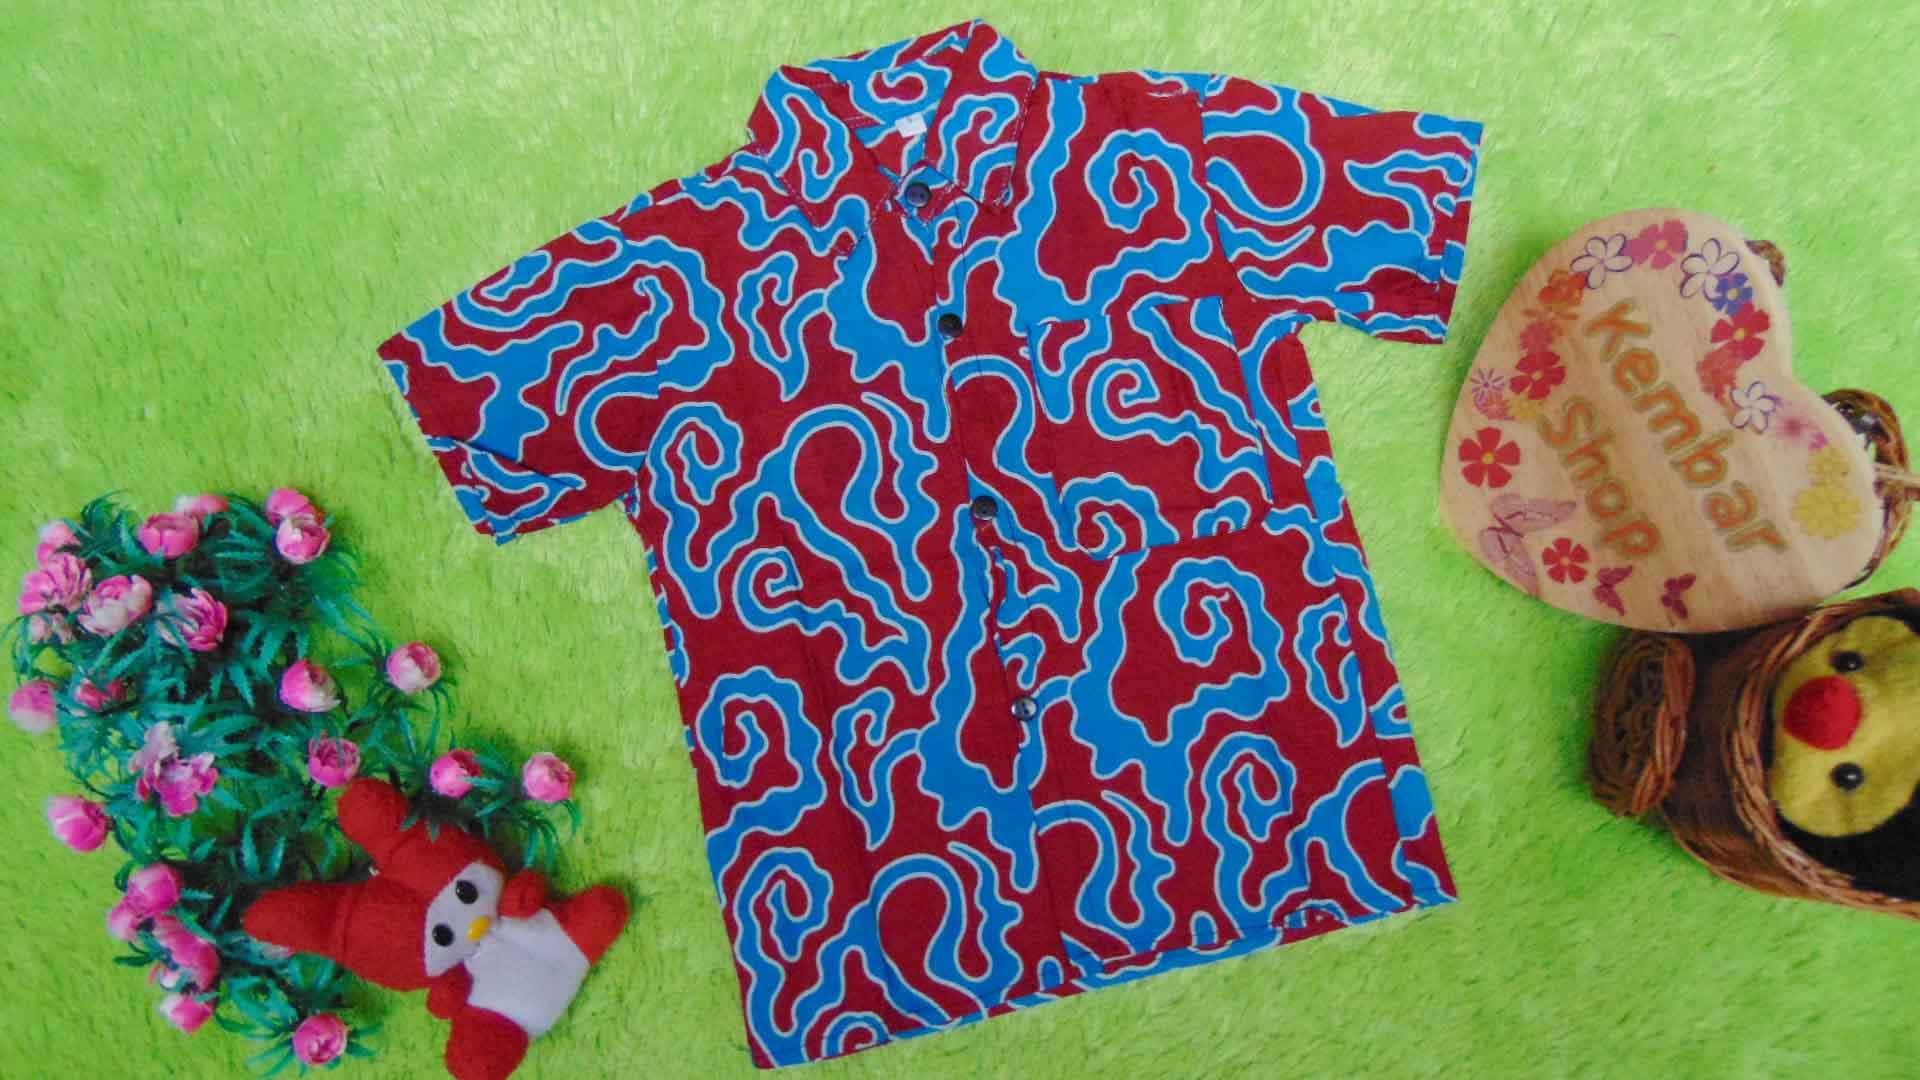 baju batik bayi anak laki-laki kemeja batik batita hem anak cowok uk 1-3th baju pesta motif merah sungai biru